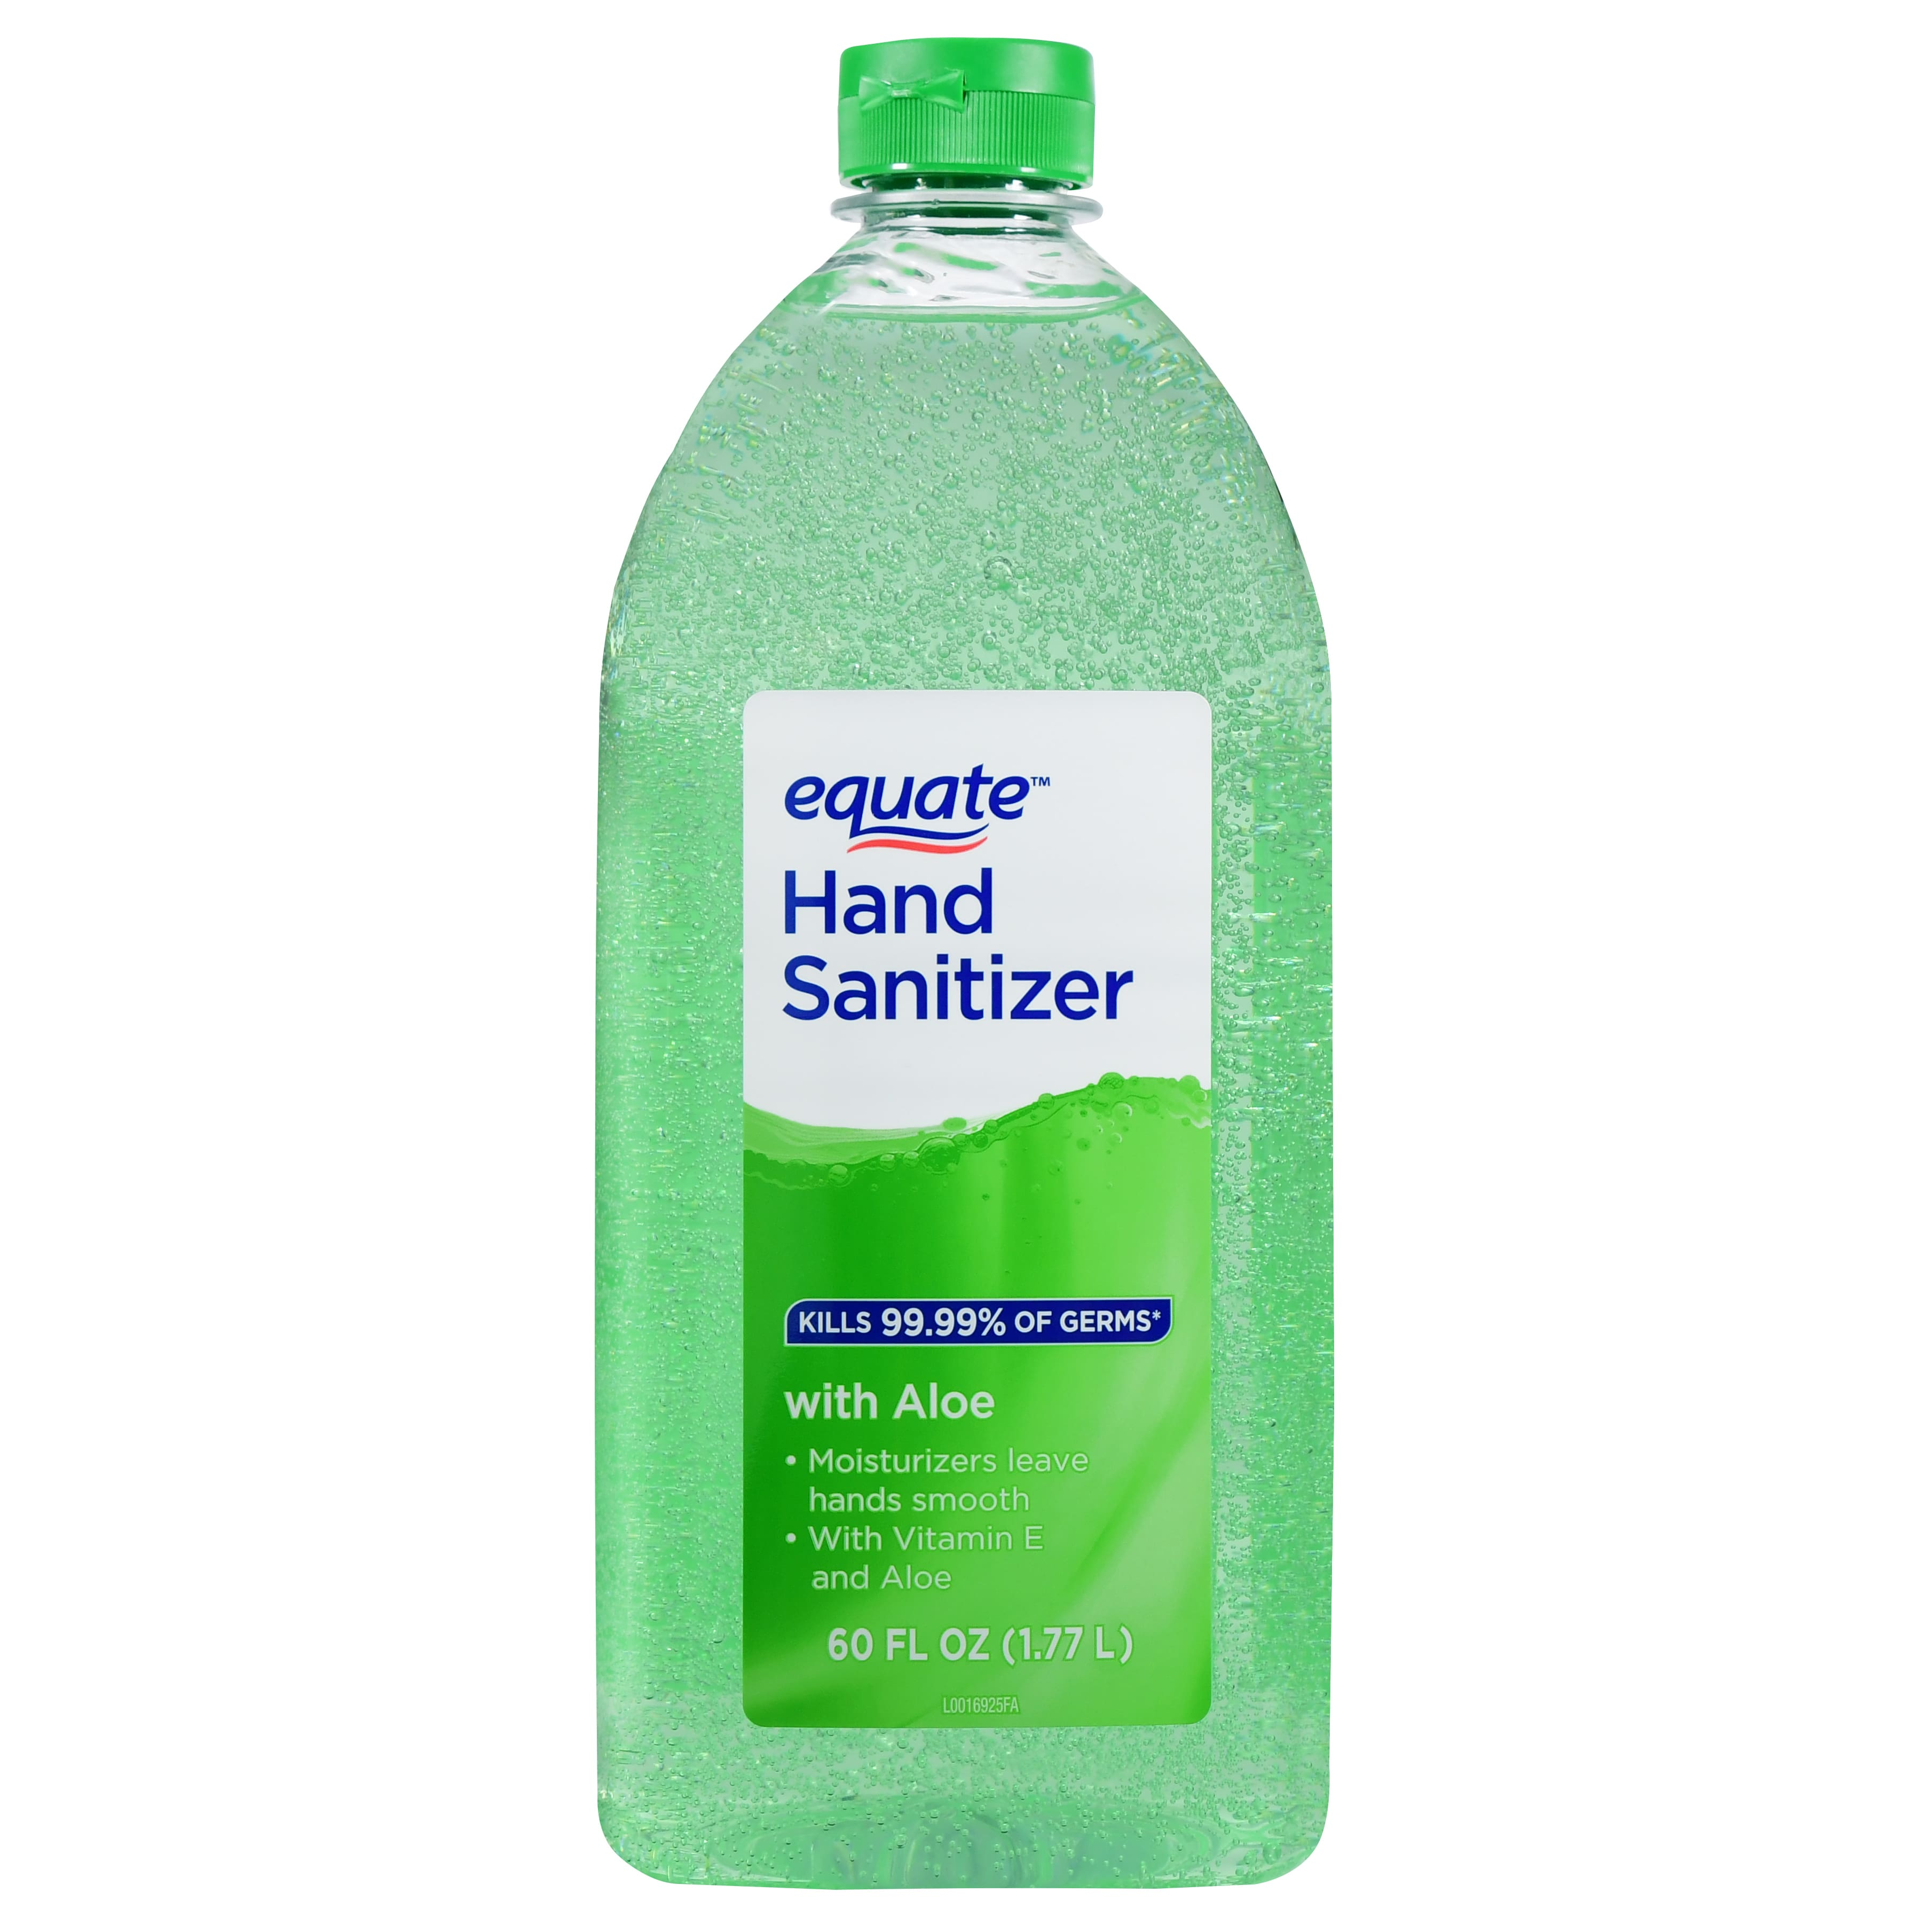 Equate Hand Sanitizer with Aloe, 60 fl oz $5.97+FS